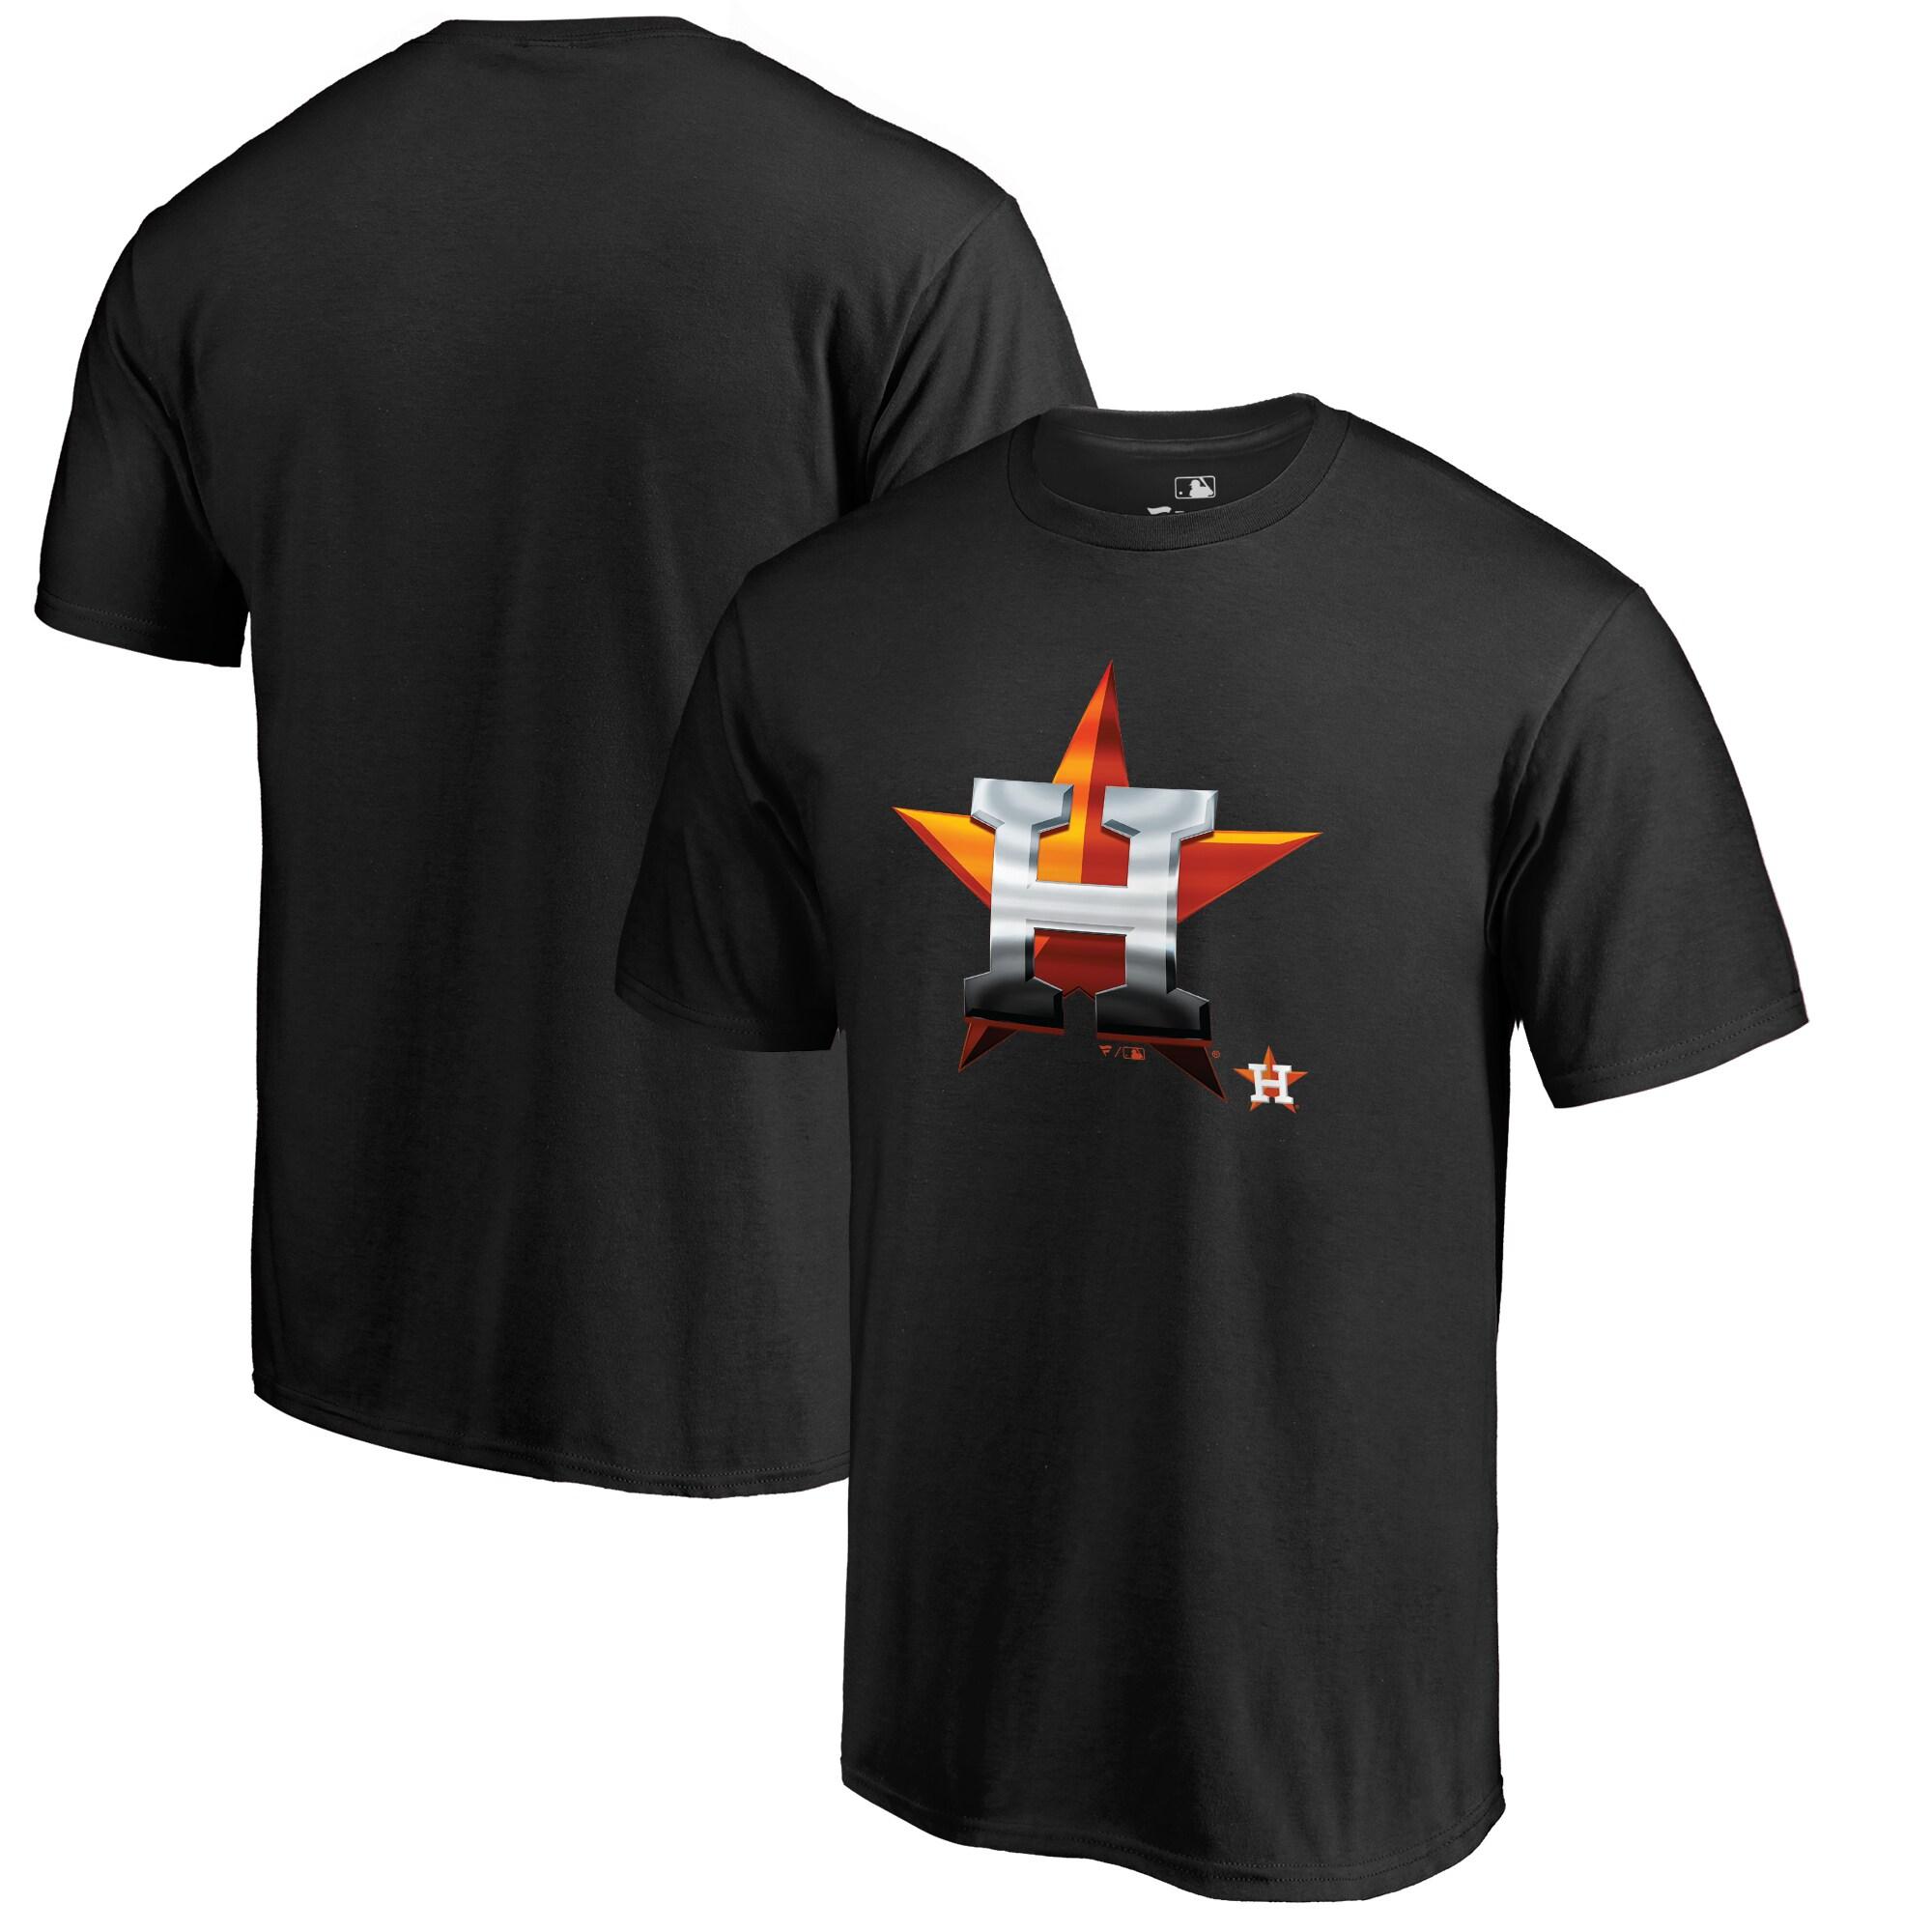 Houston Astros Fanatics Branded Big & Tall Midnight Mascot T-Shirt - Black